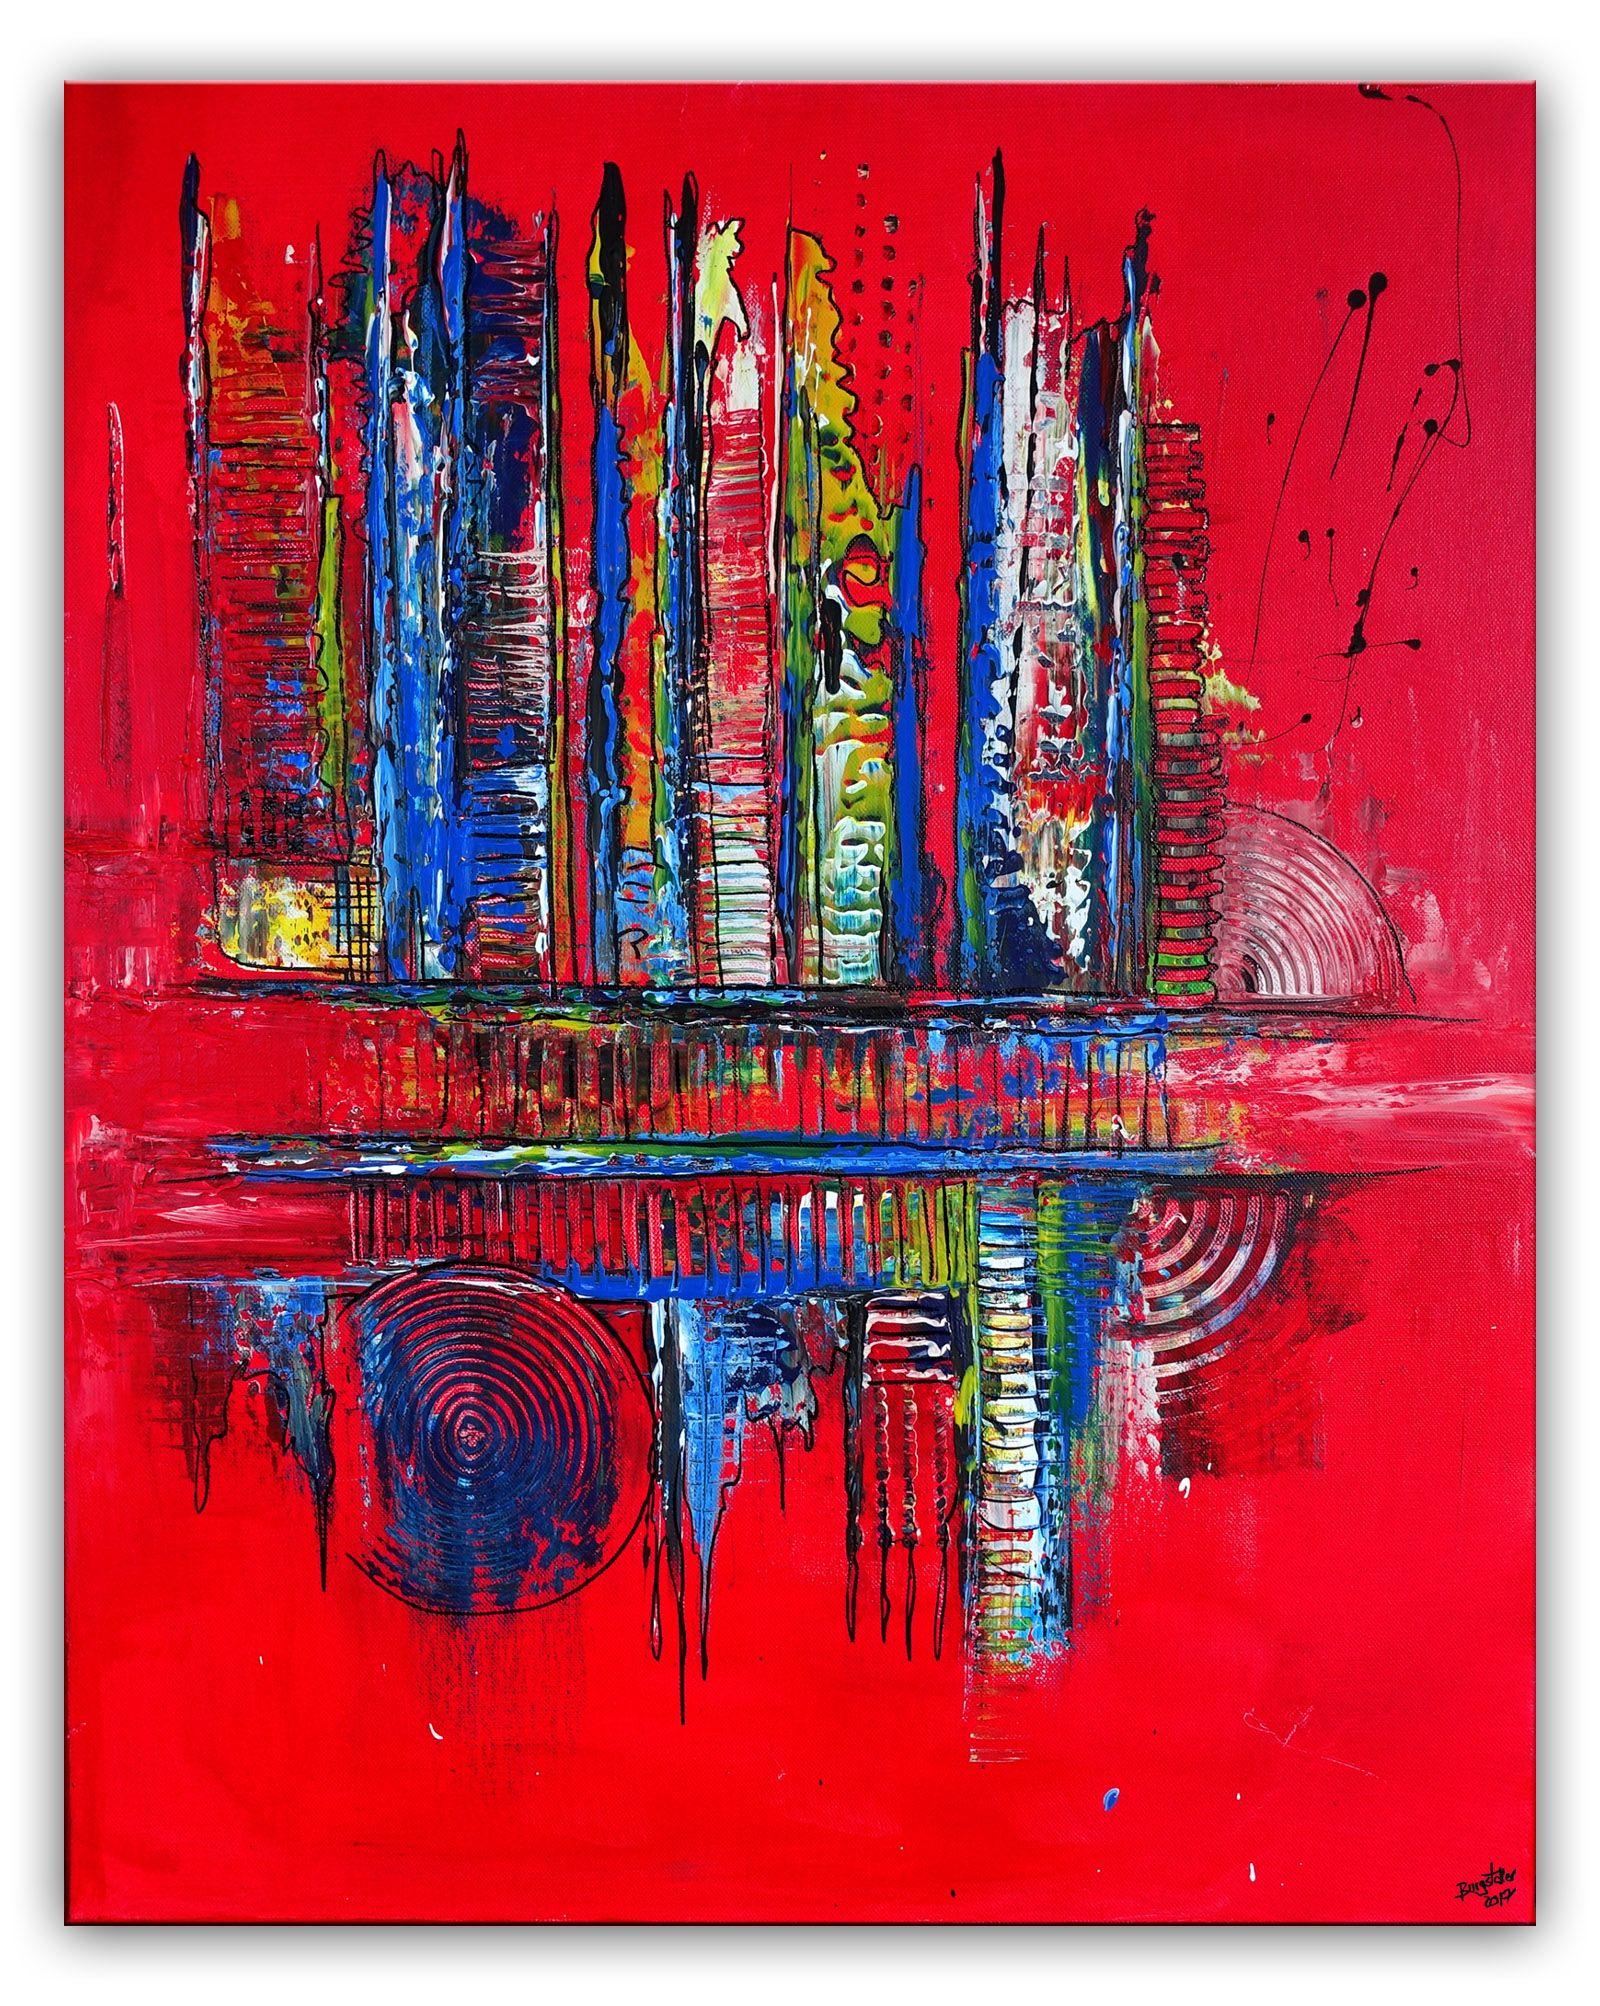 aachen abstrakte malerei braun acrylbild wandbild abstrakt abstraktes gemalde bilder rot orange kunst körper